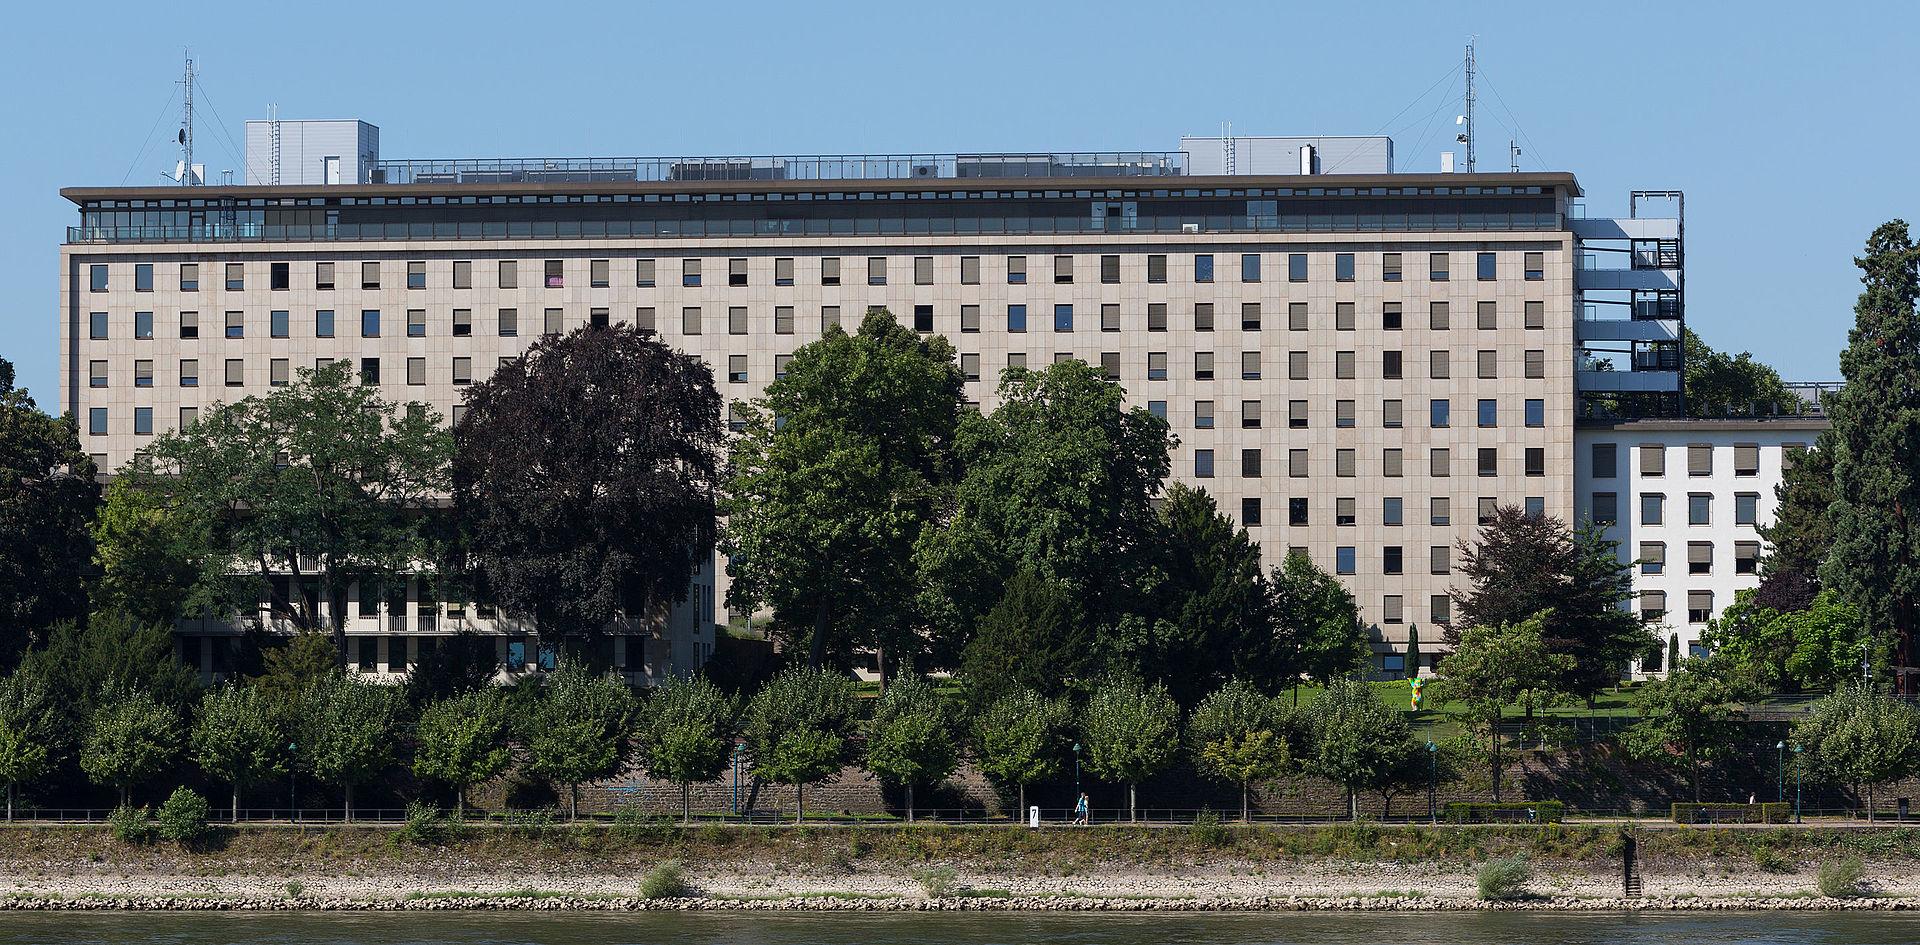 Bild Auswärtiges Amt Bonn